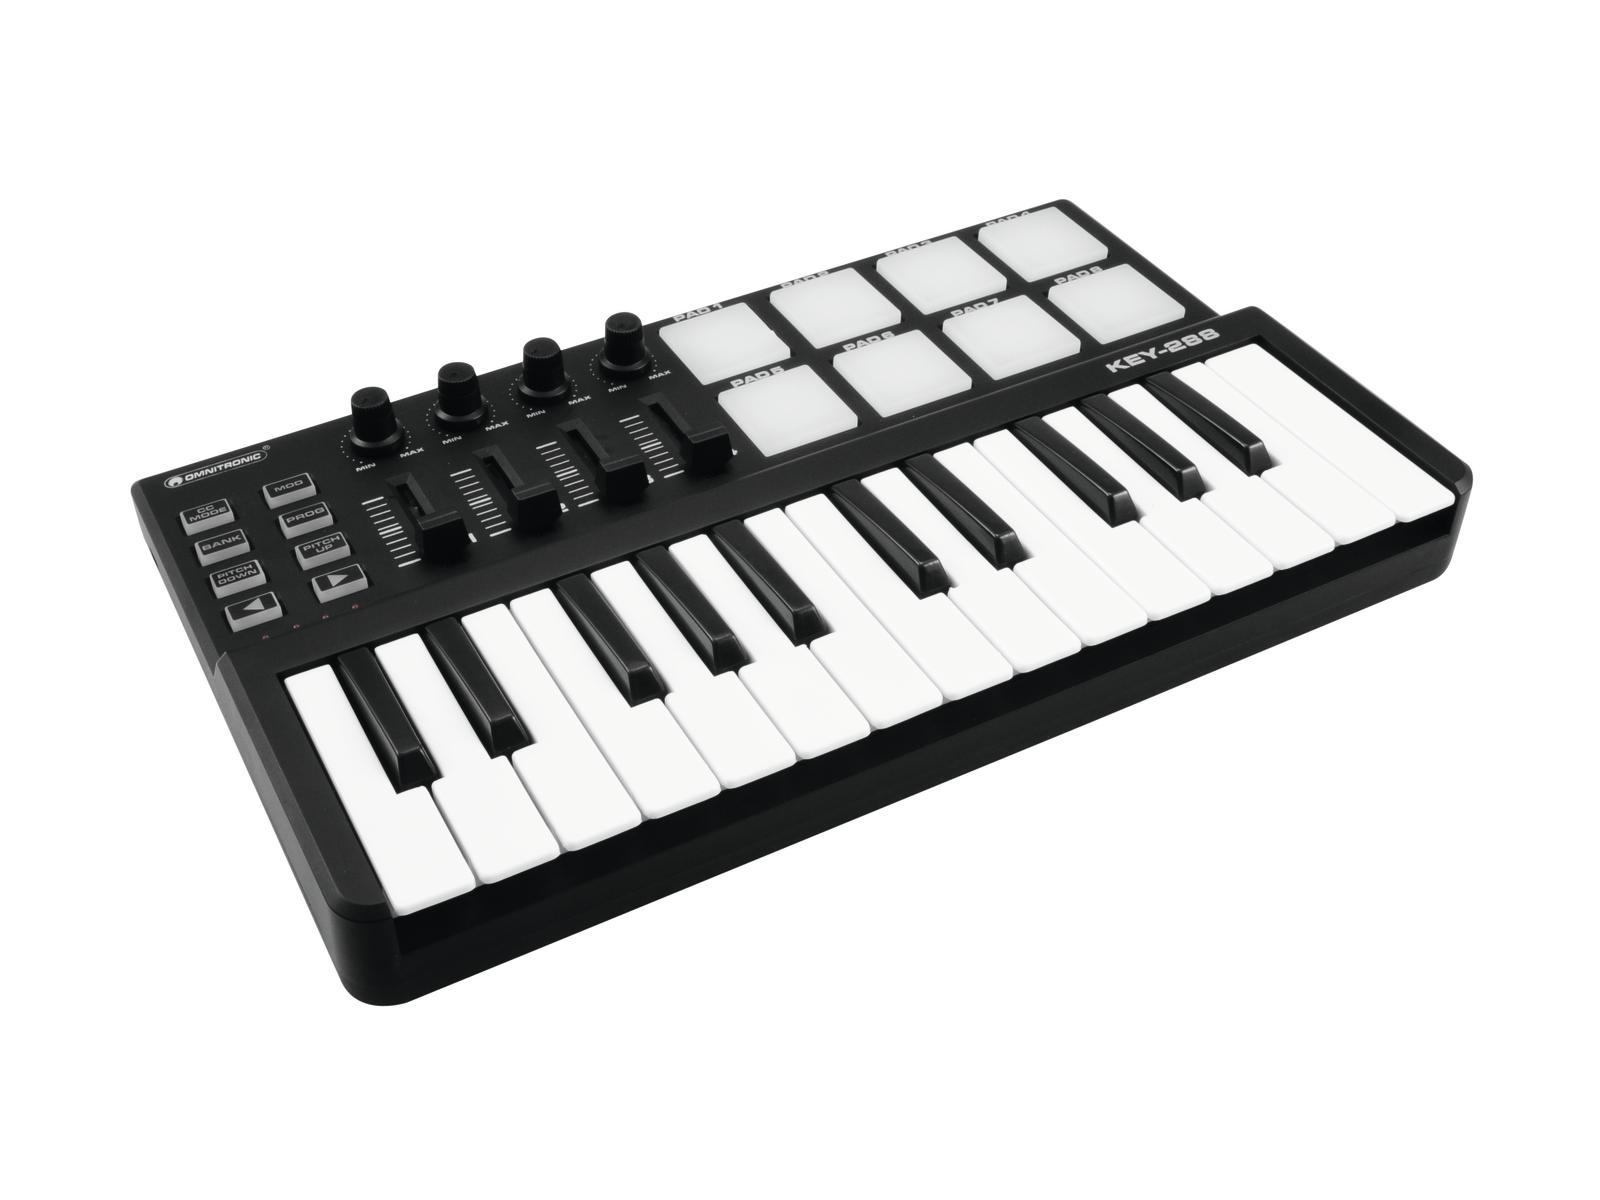 omnitronic-key-288-midi-controller